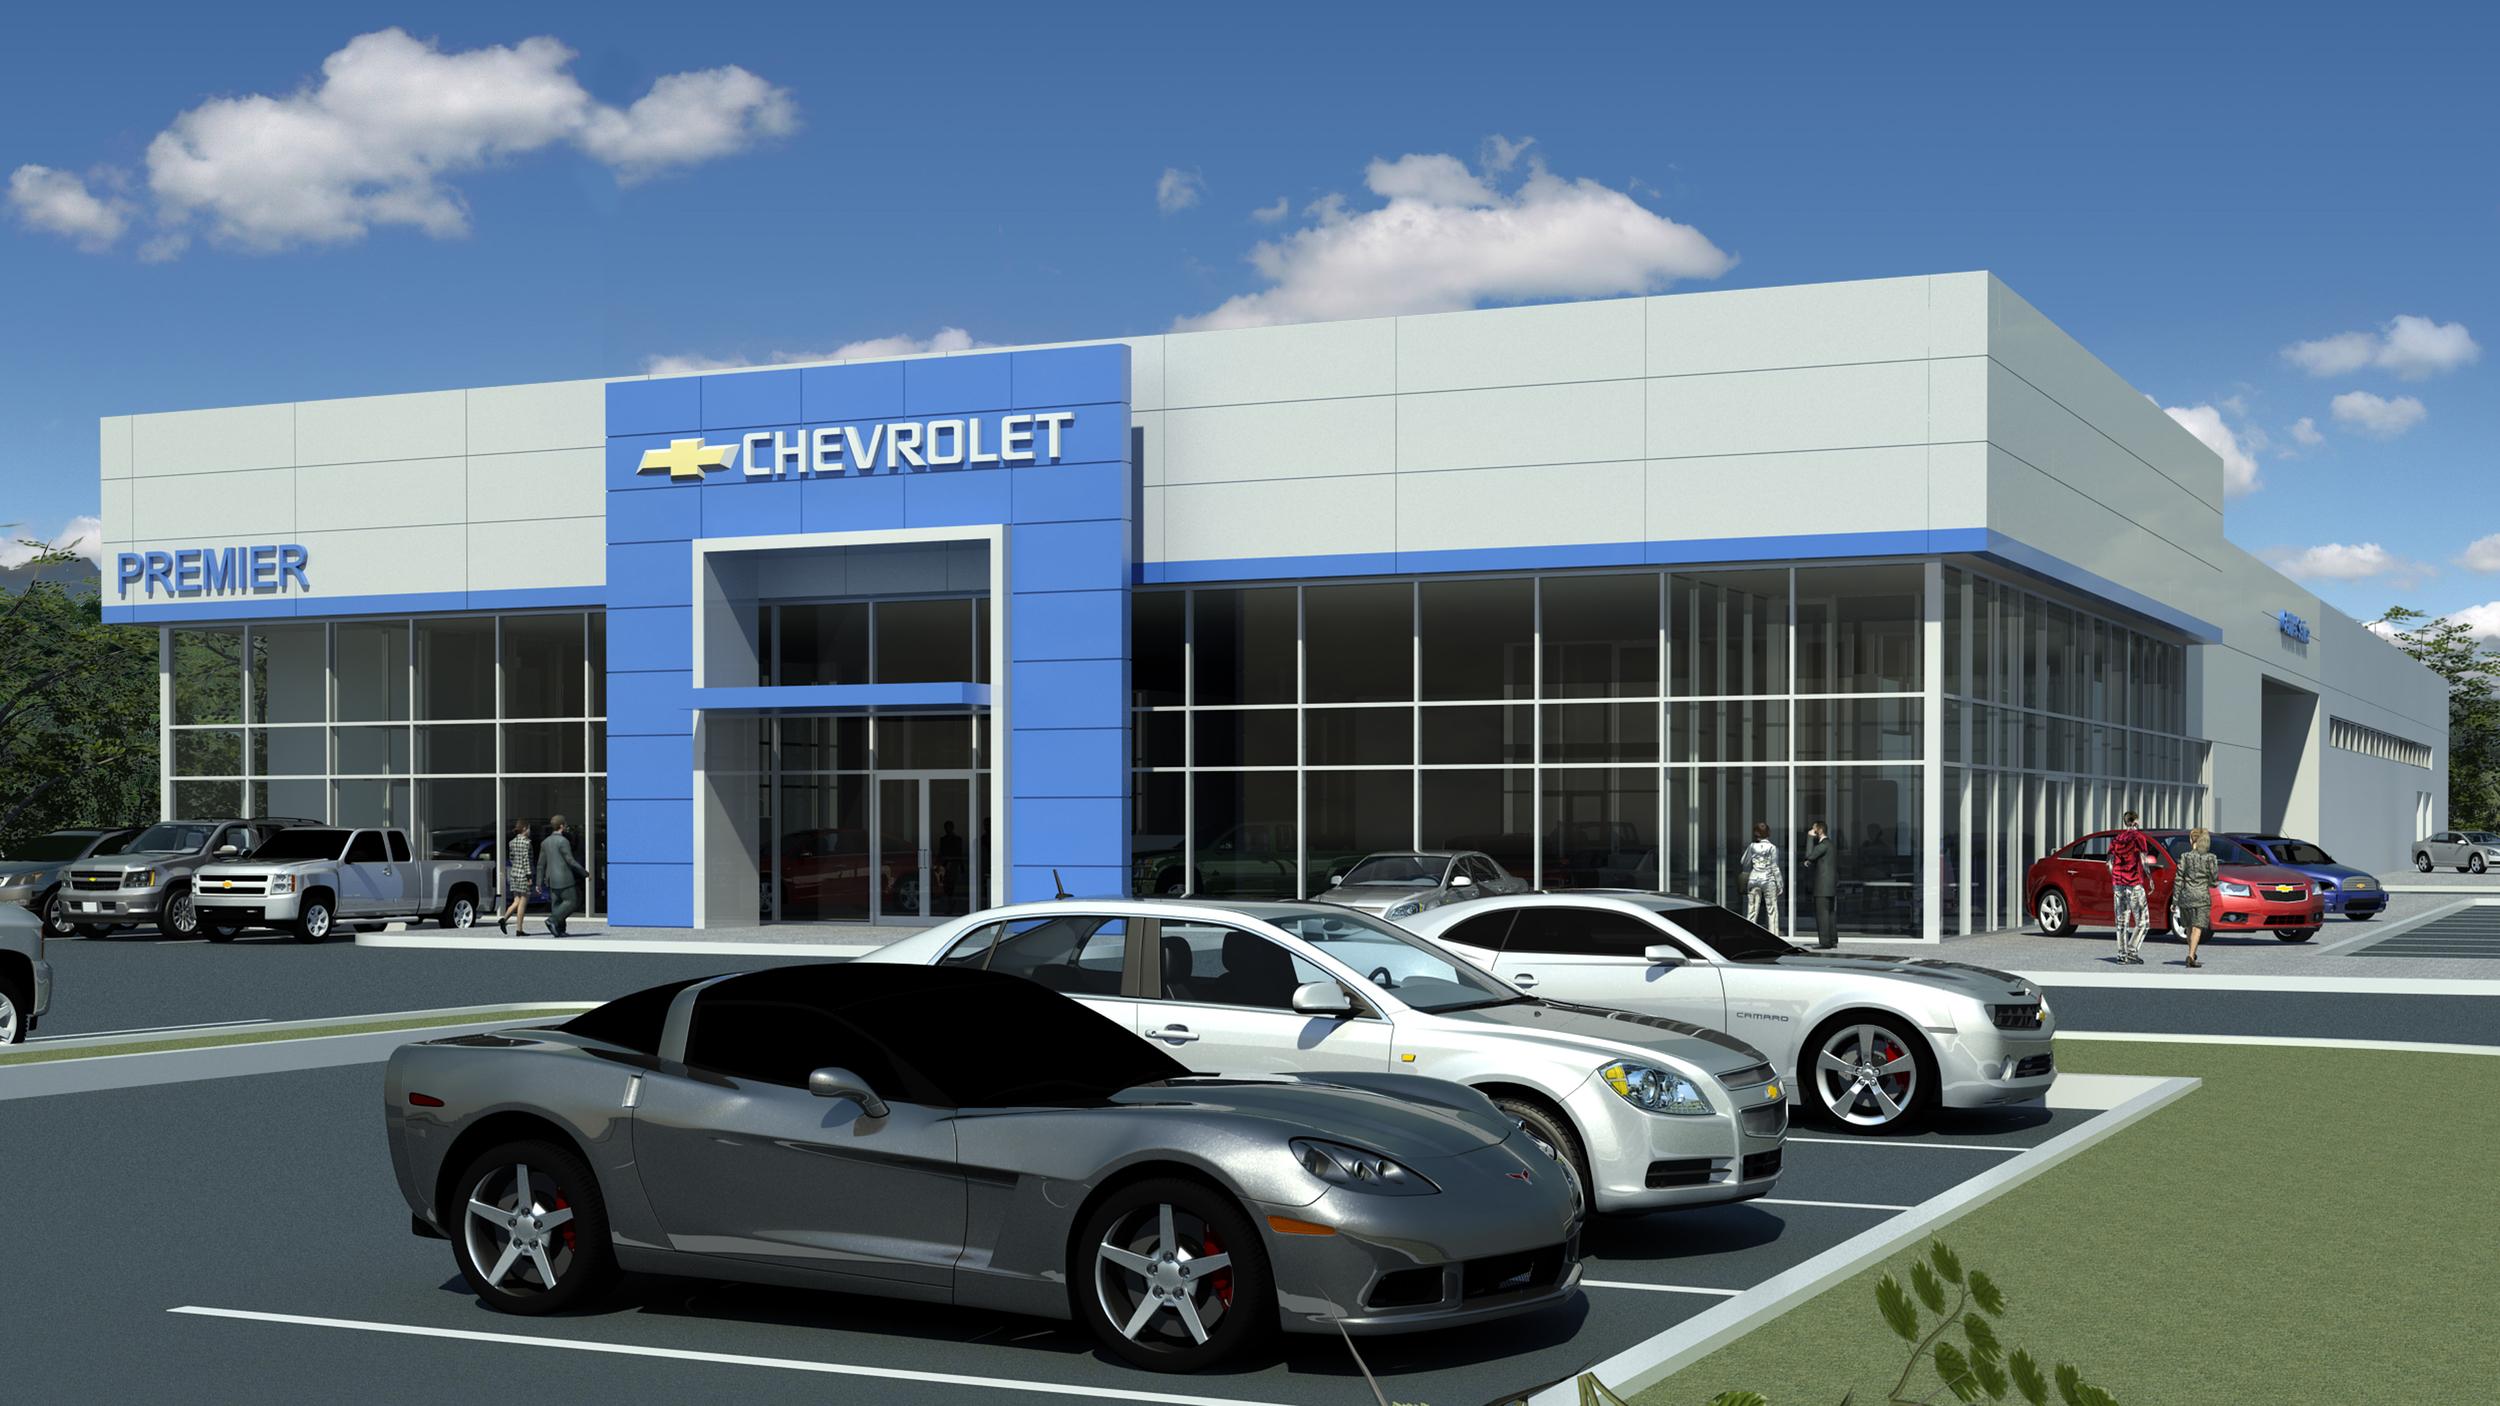 278860_Premier Chevrolet_Rendering.jpg